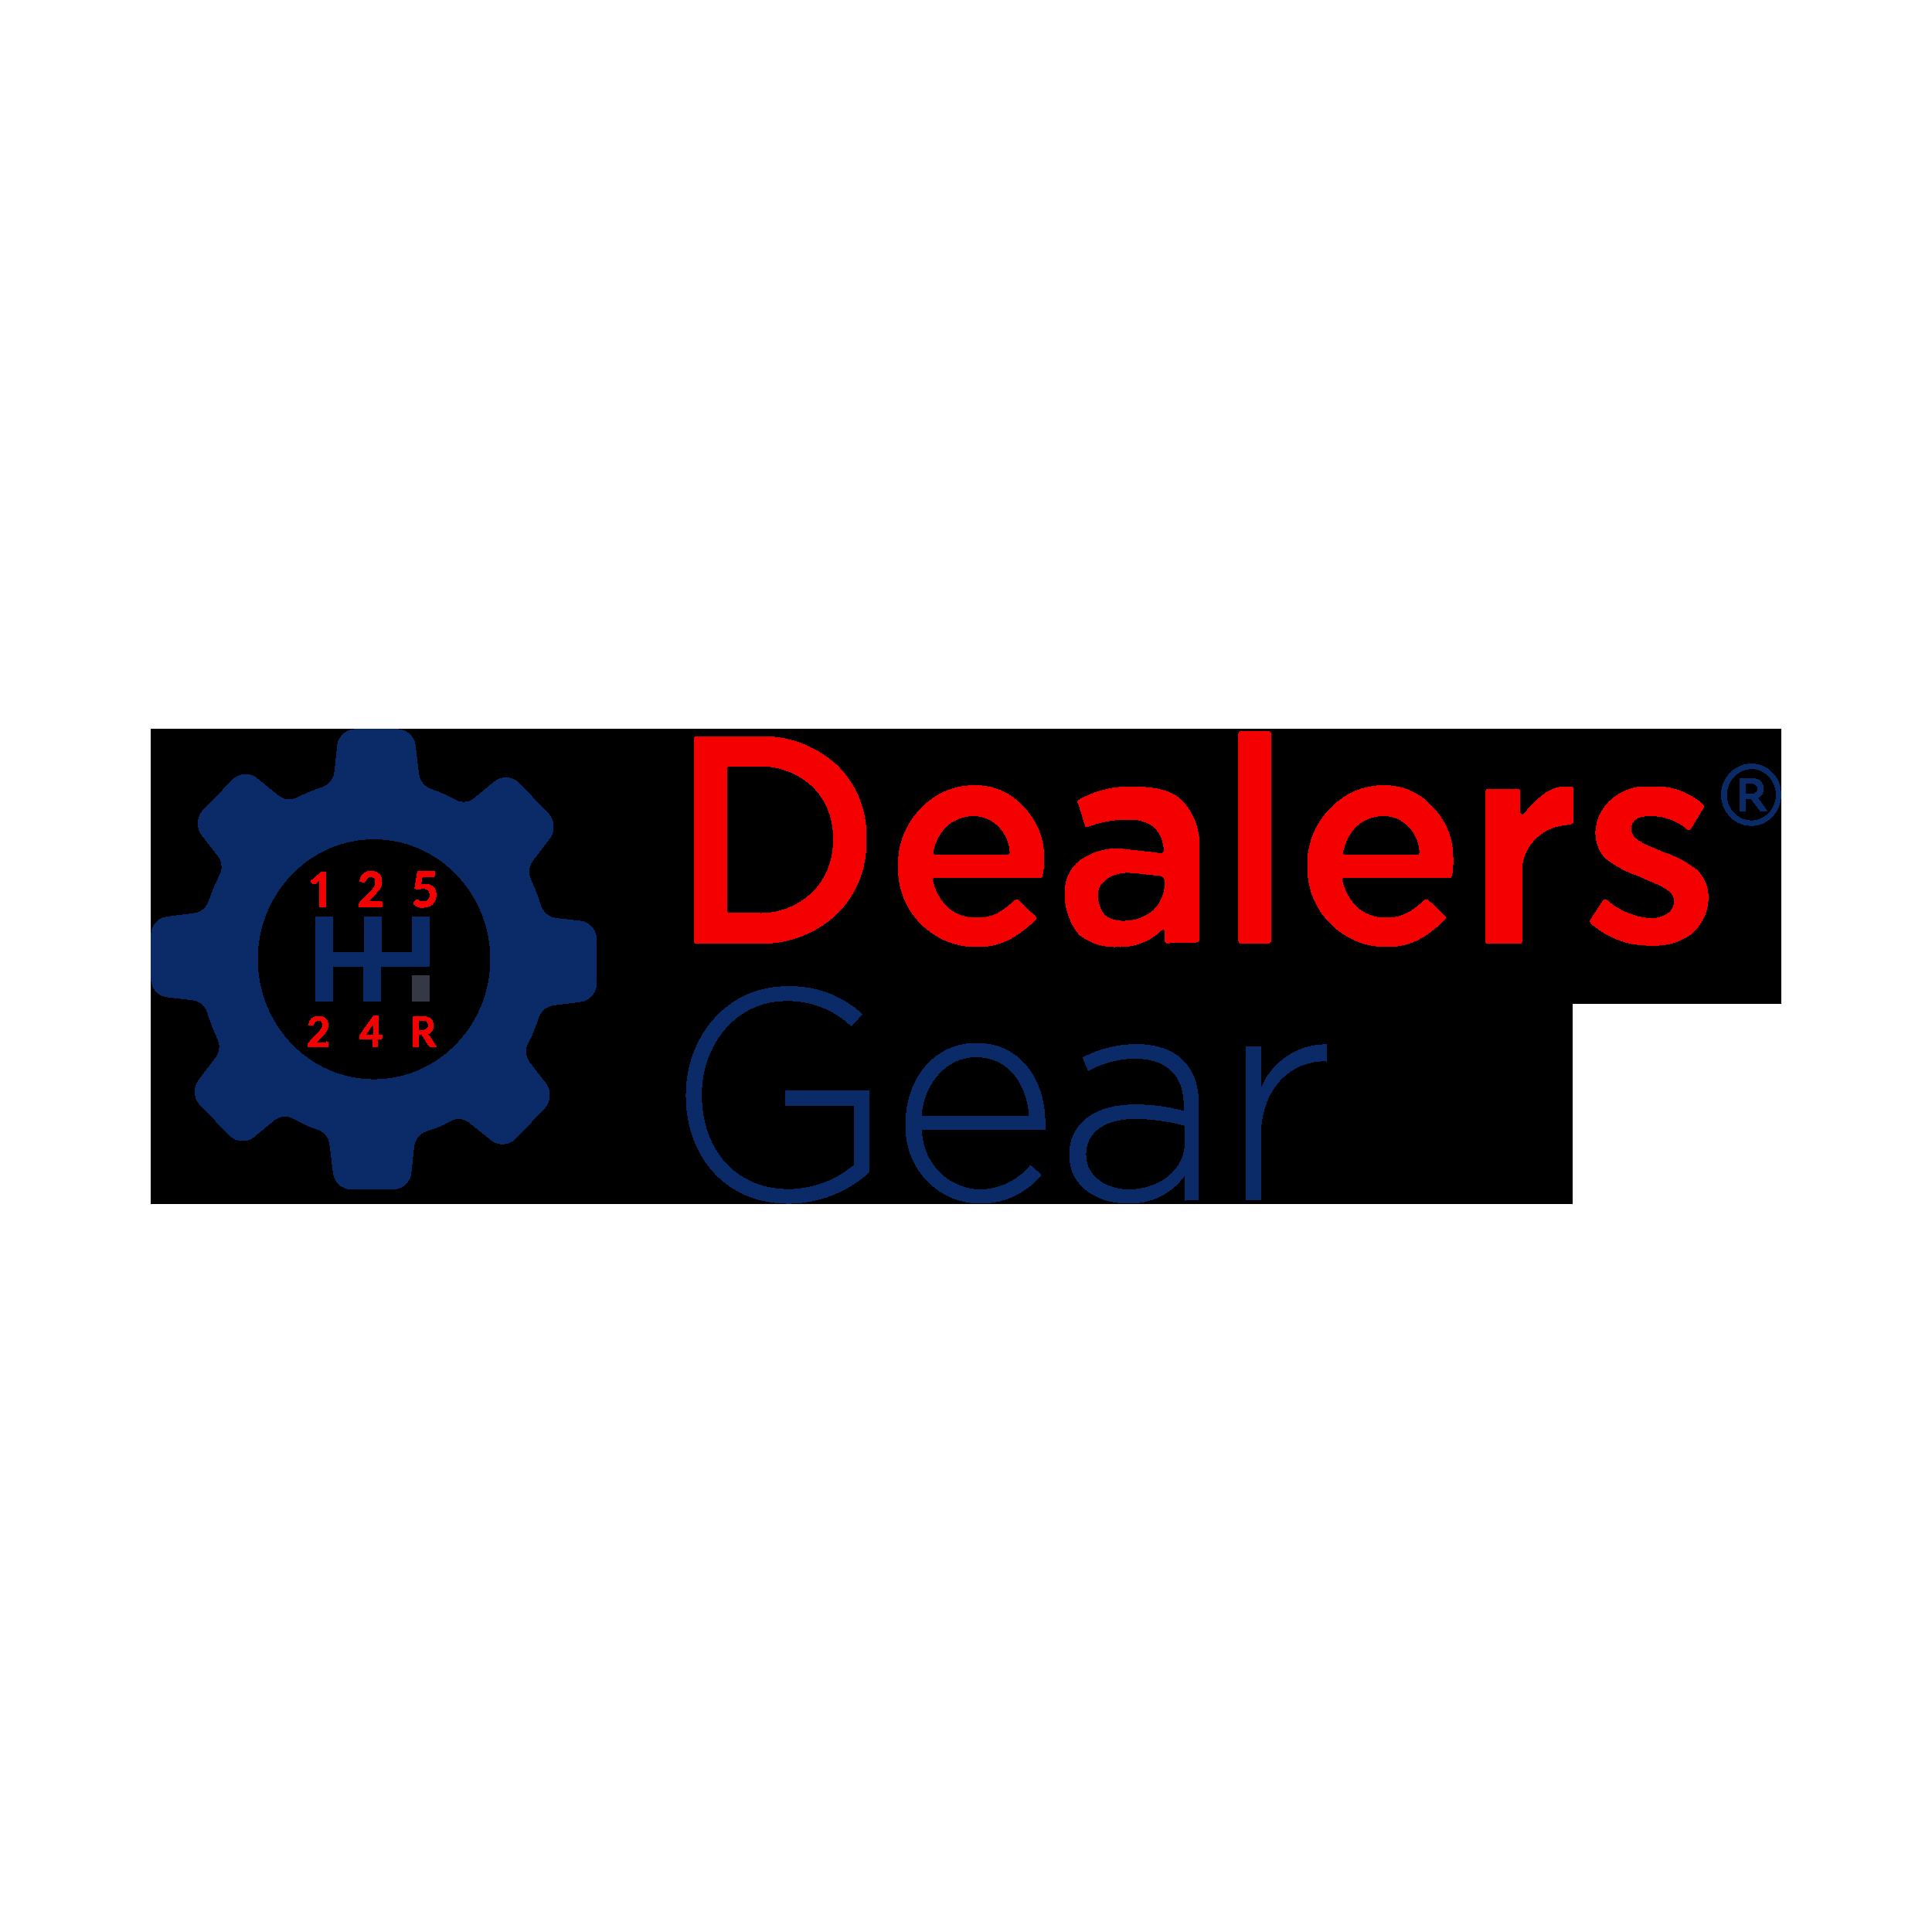 DealersGear/BDC & Sales Training